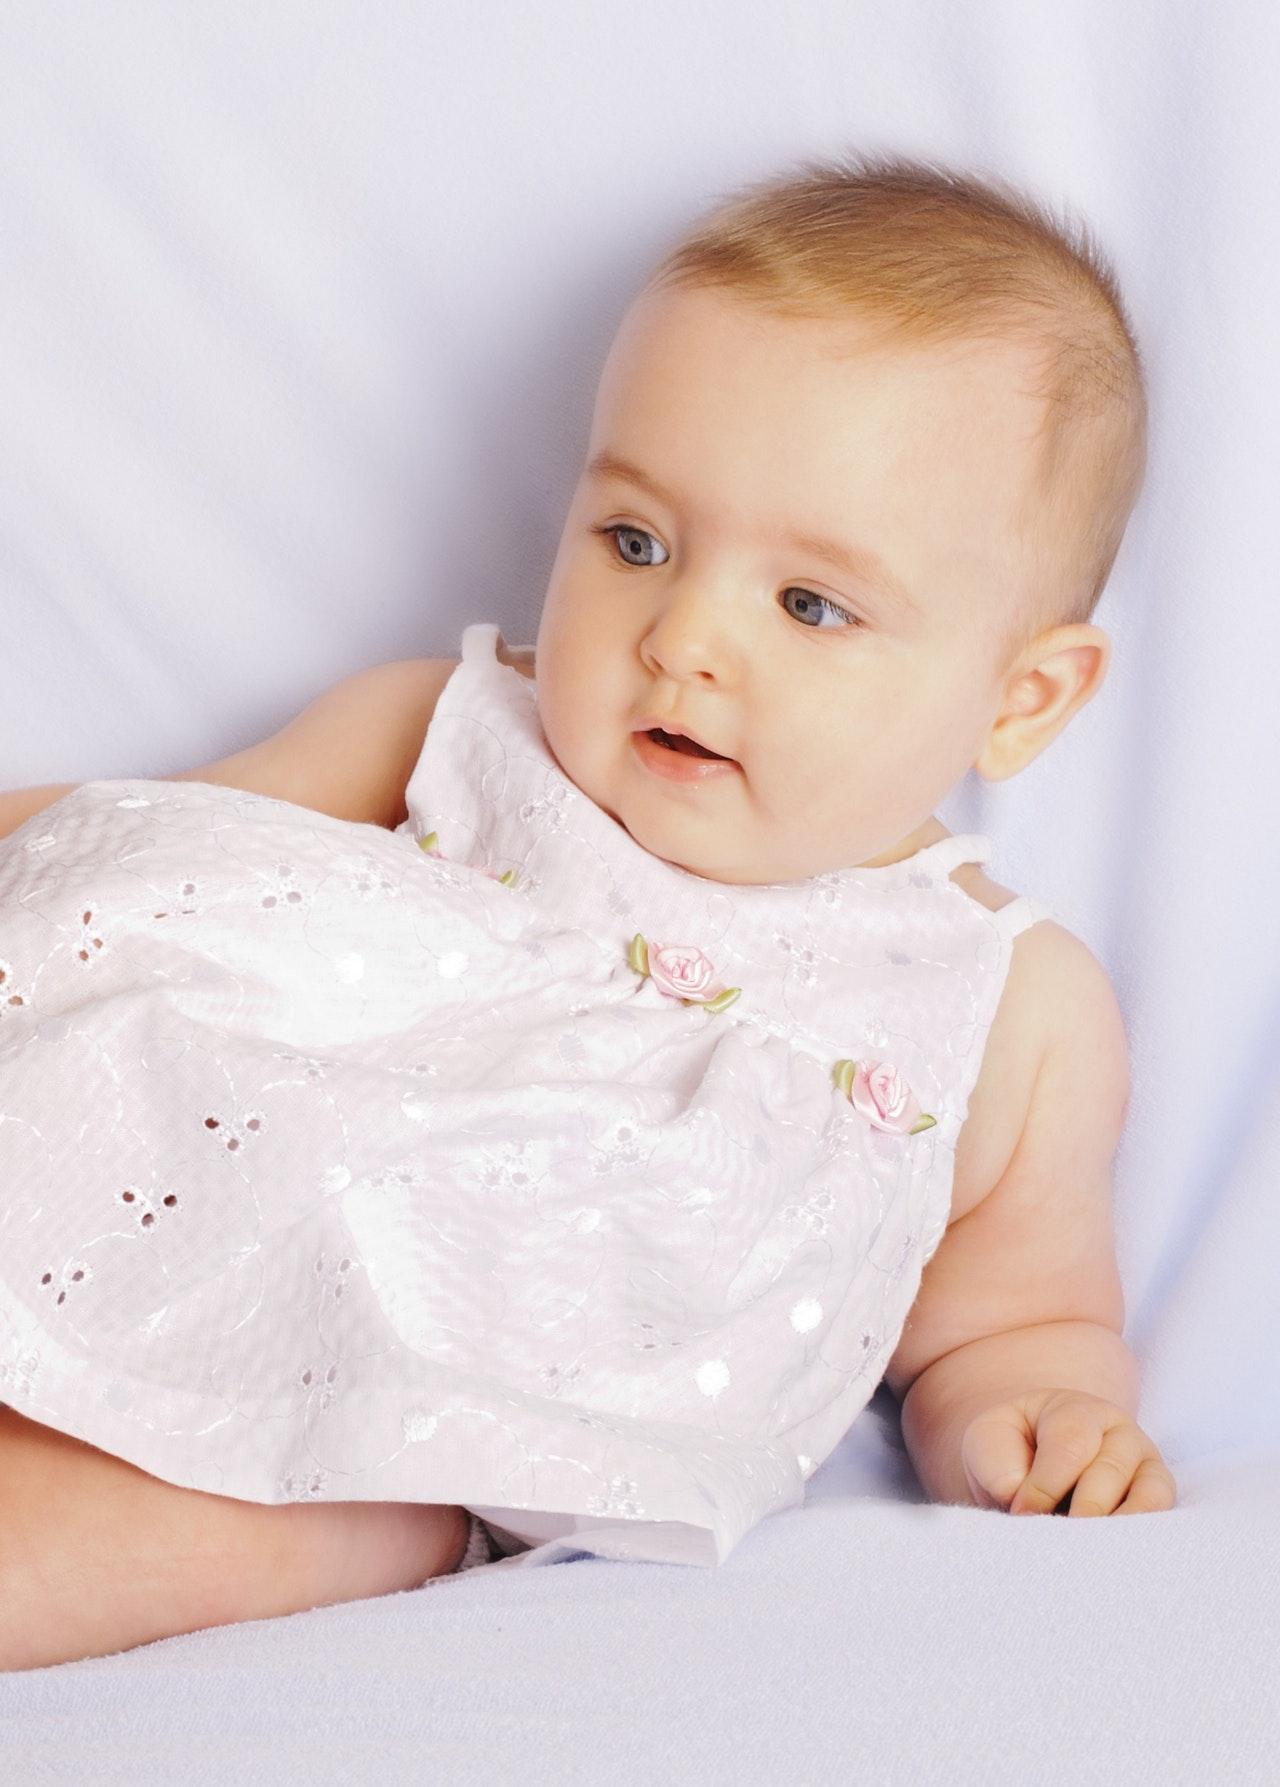 Track my development: Infants 3-6 months